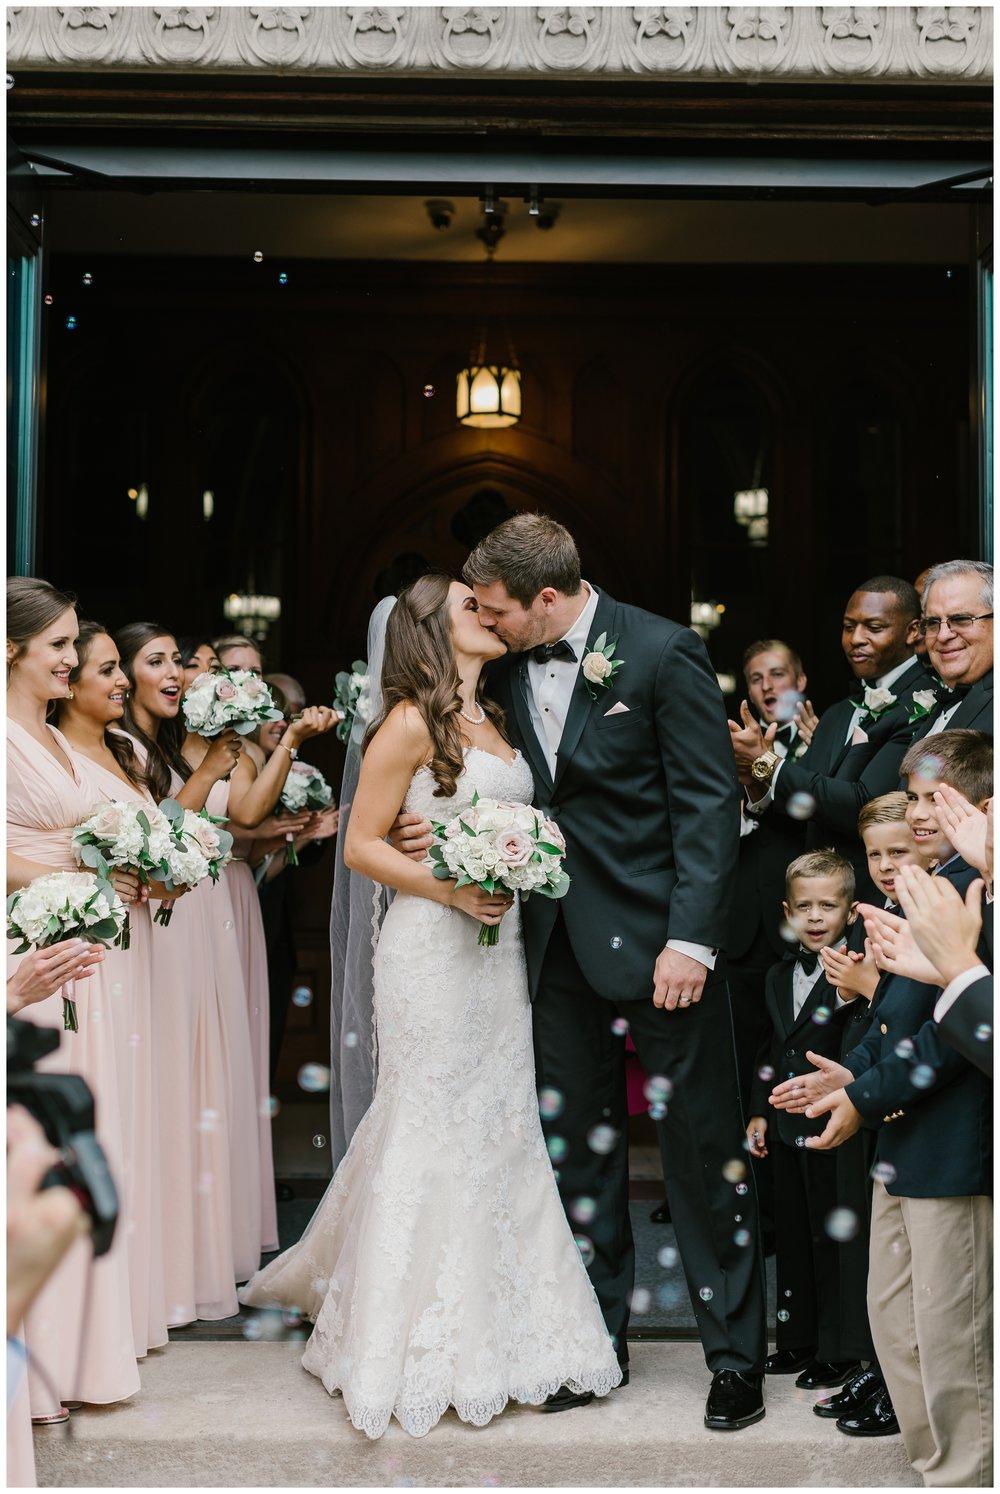 Rebecca_Bridges_Photography_Indianapolis_Wedding_Photographer_6815.jpg